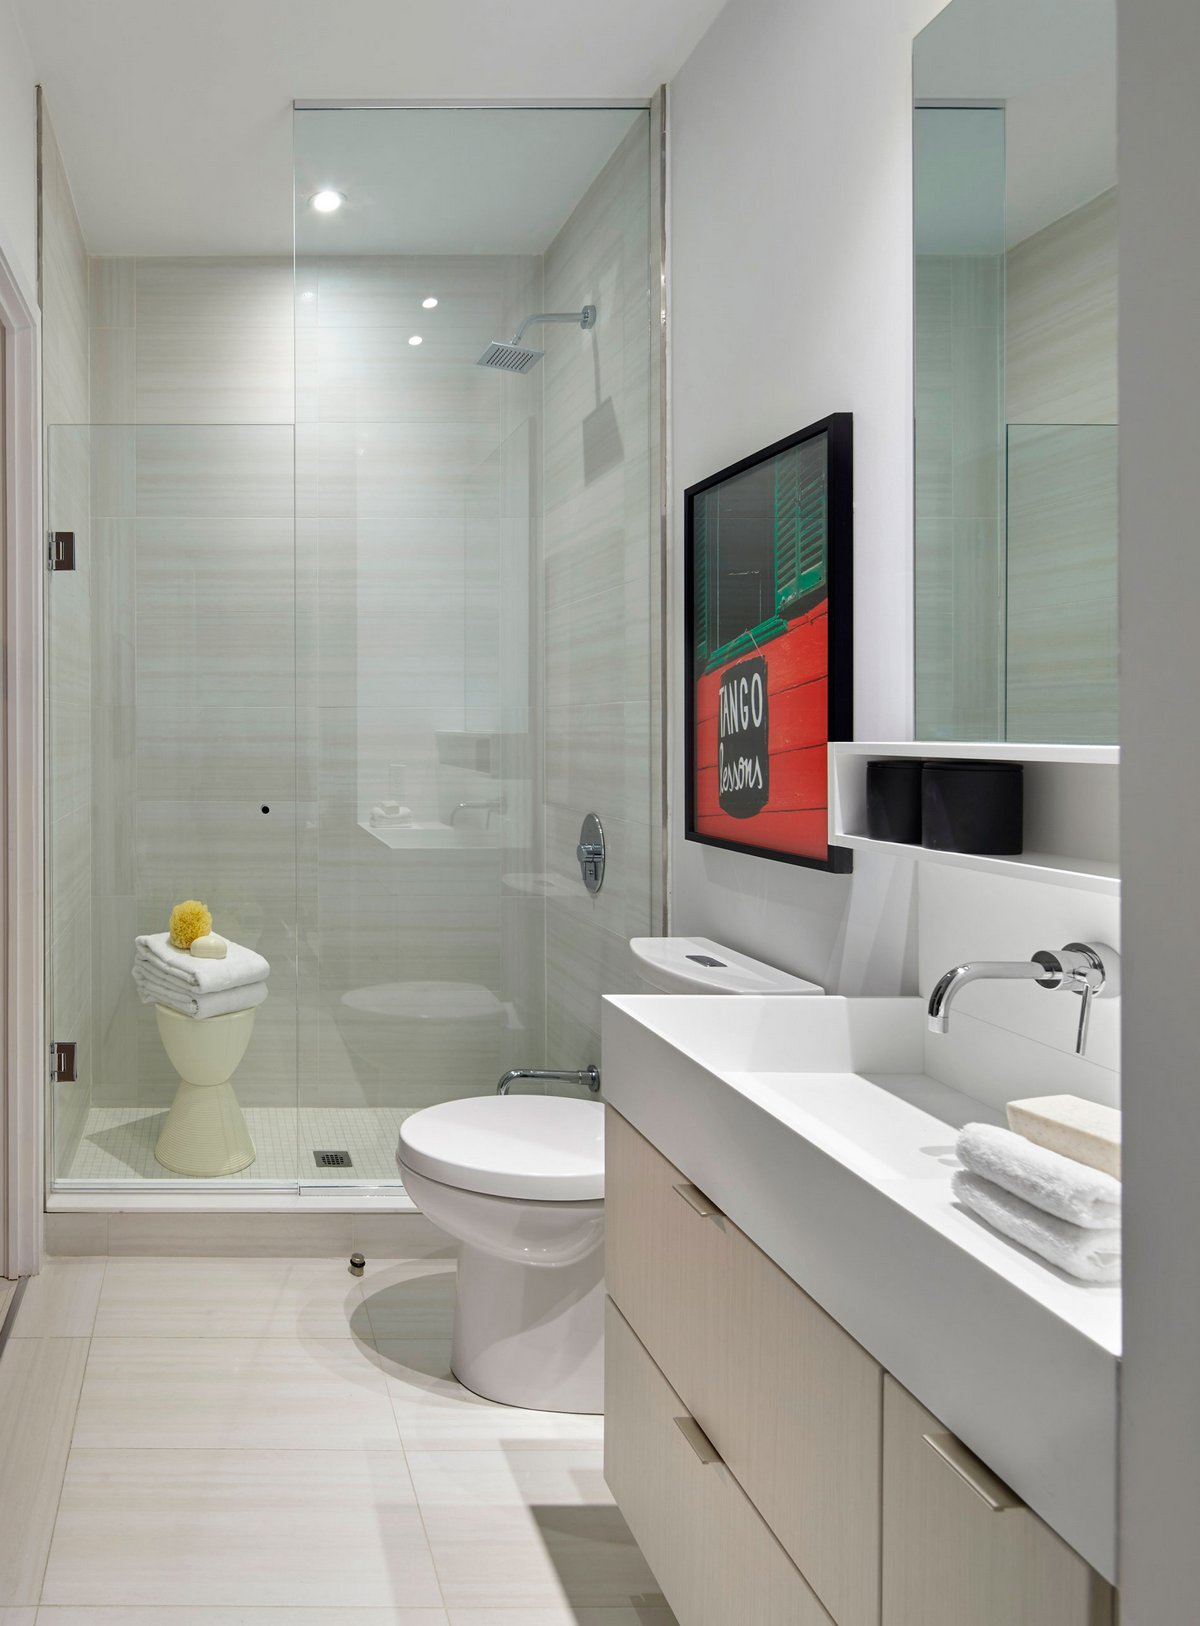 Contemporary bathroom wall art